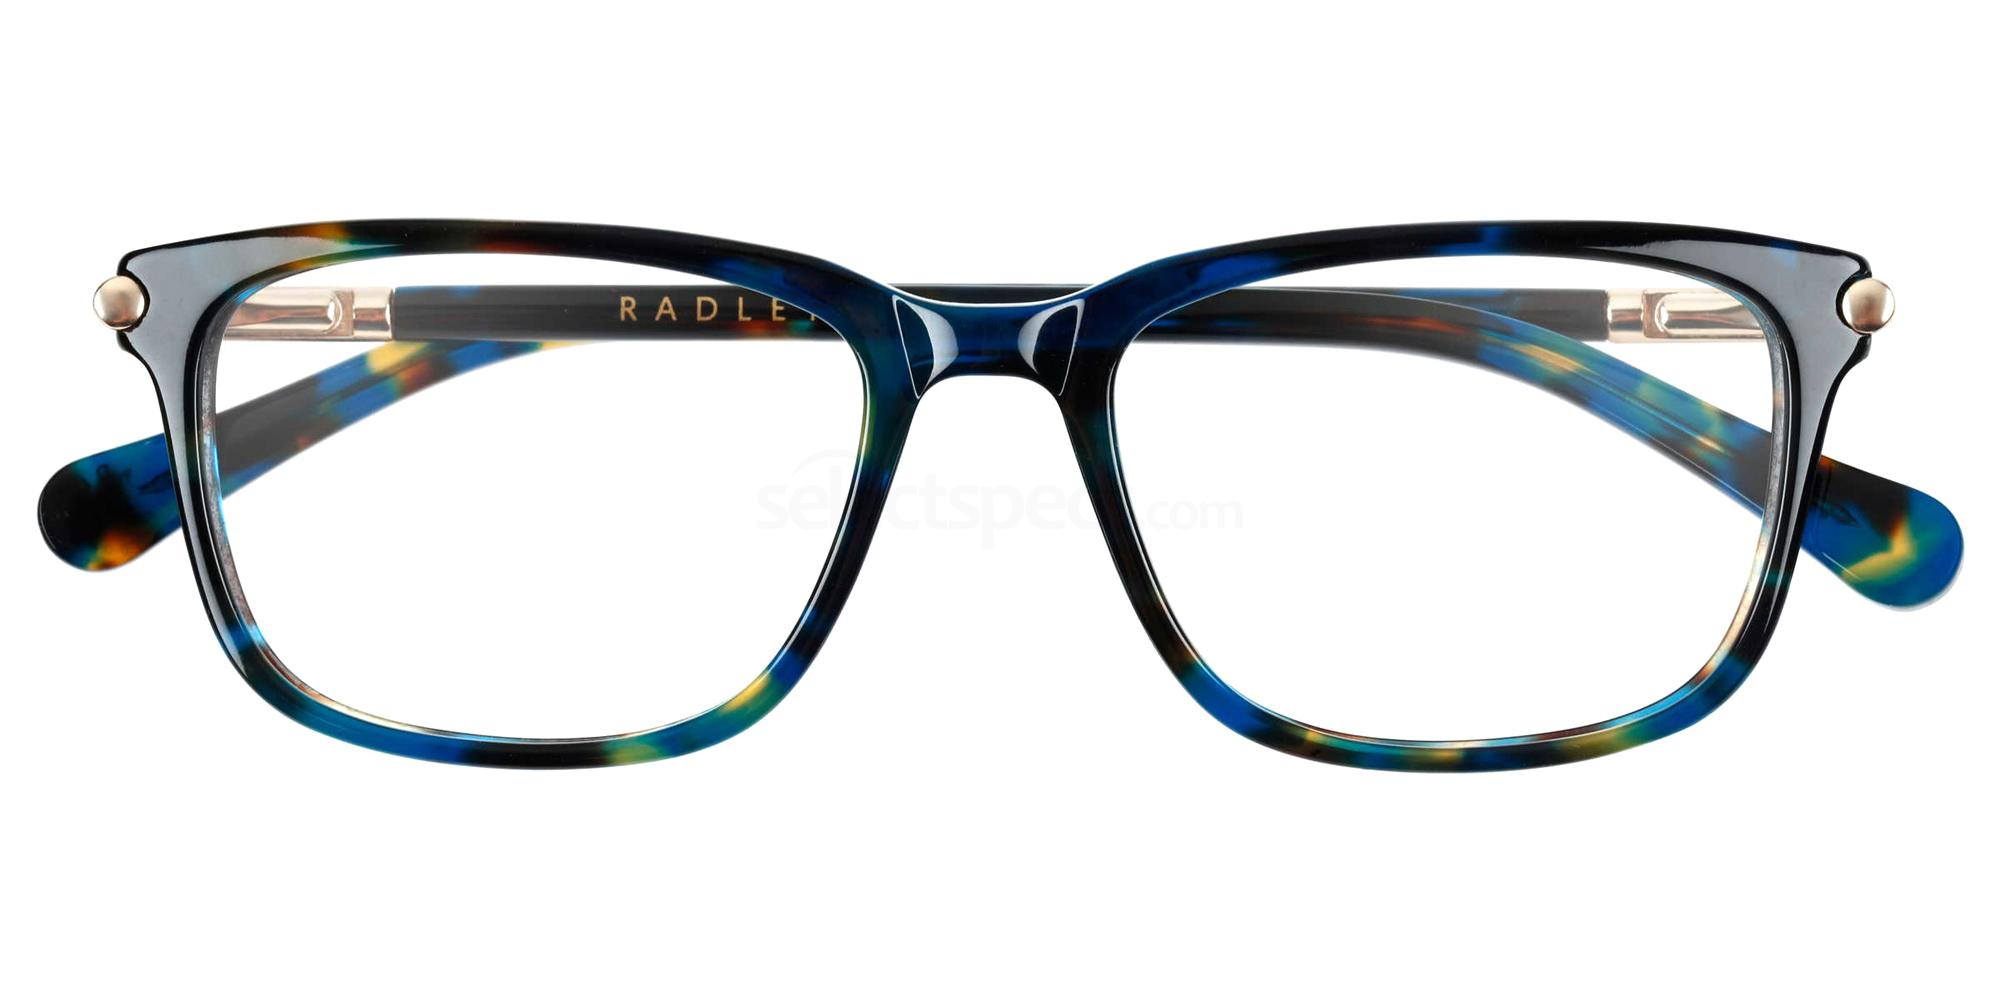 107 RDO-LUCIANNA Glasses, Radley London